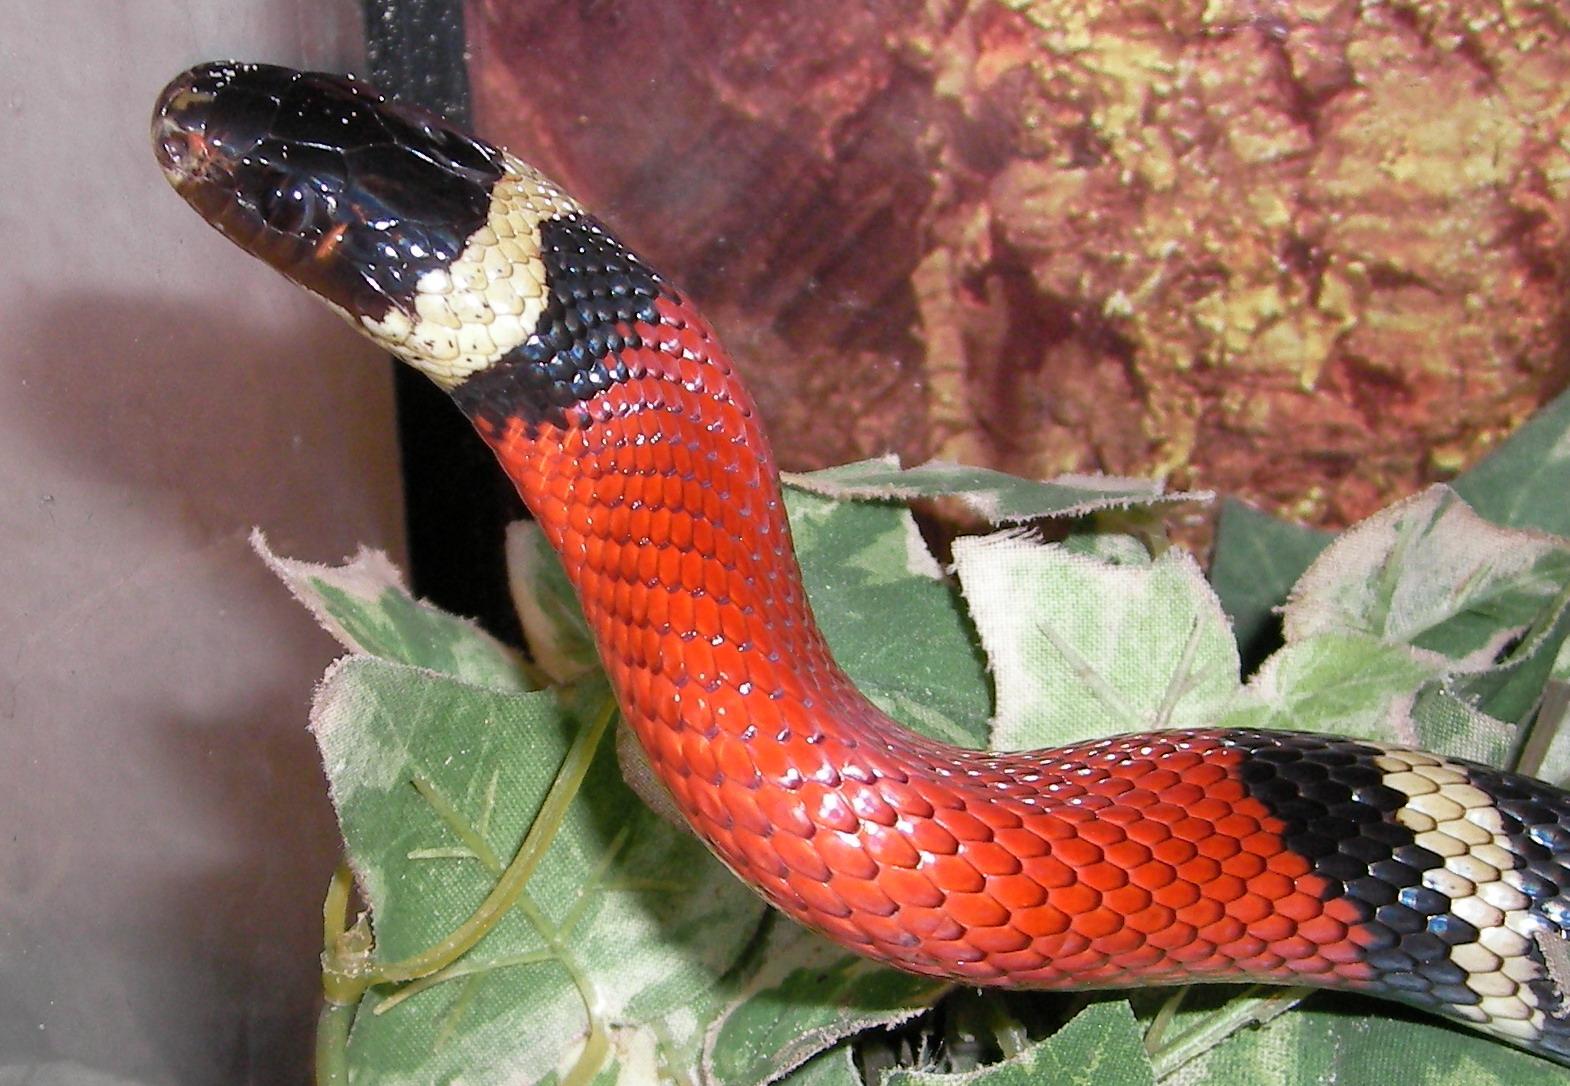 Sinaloan milk snake - Wikipedia